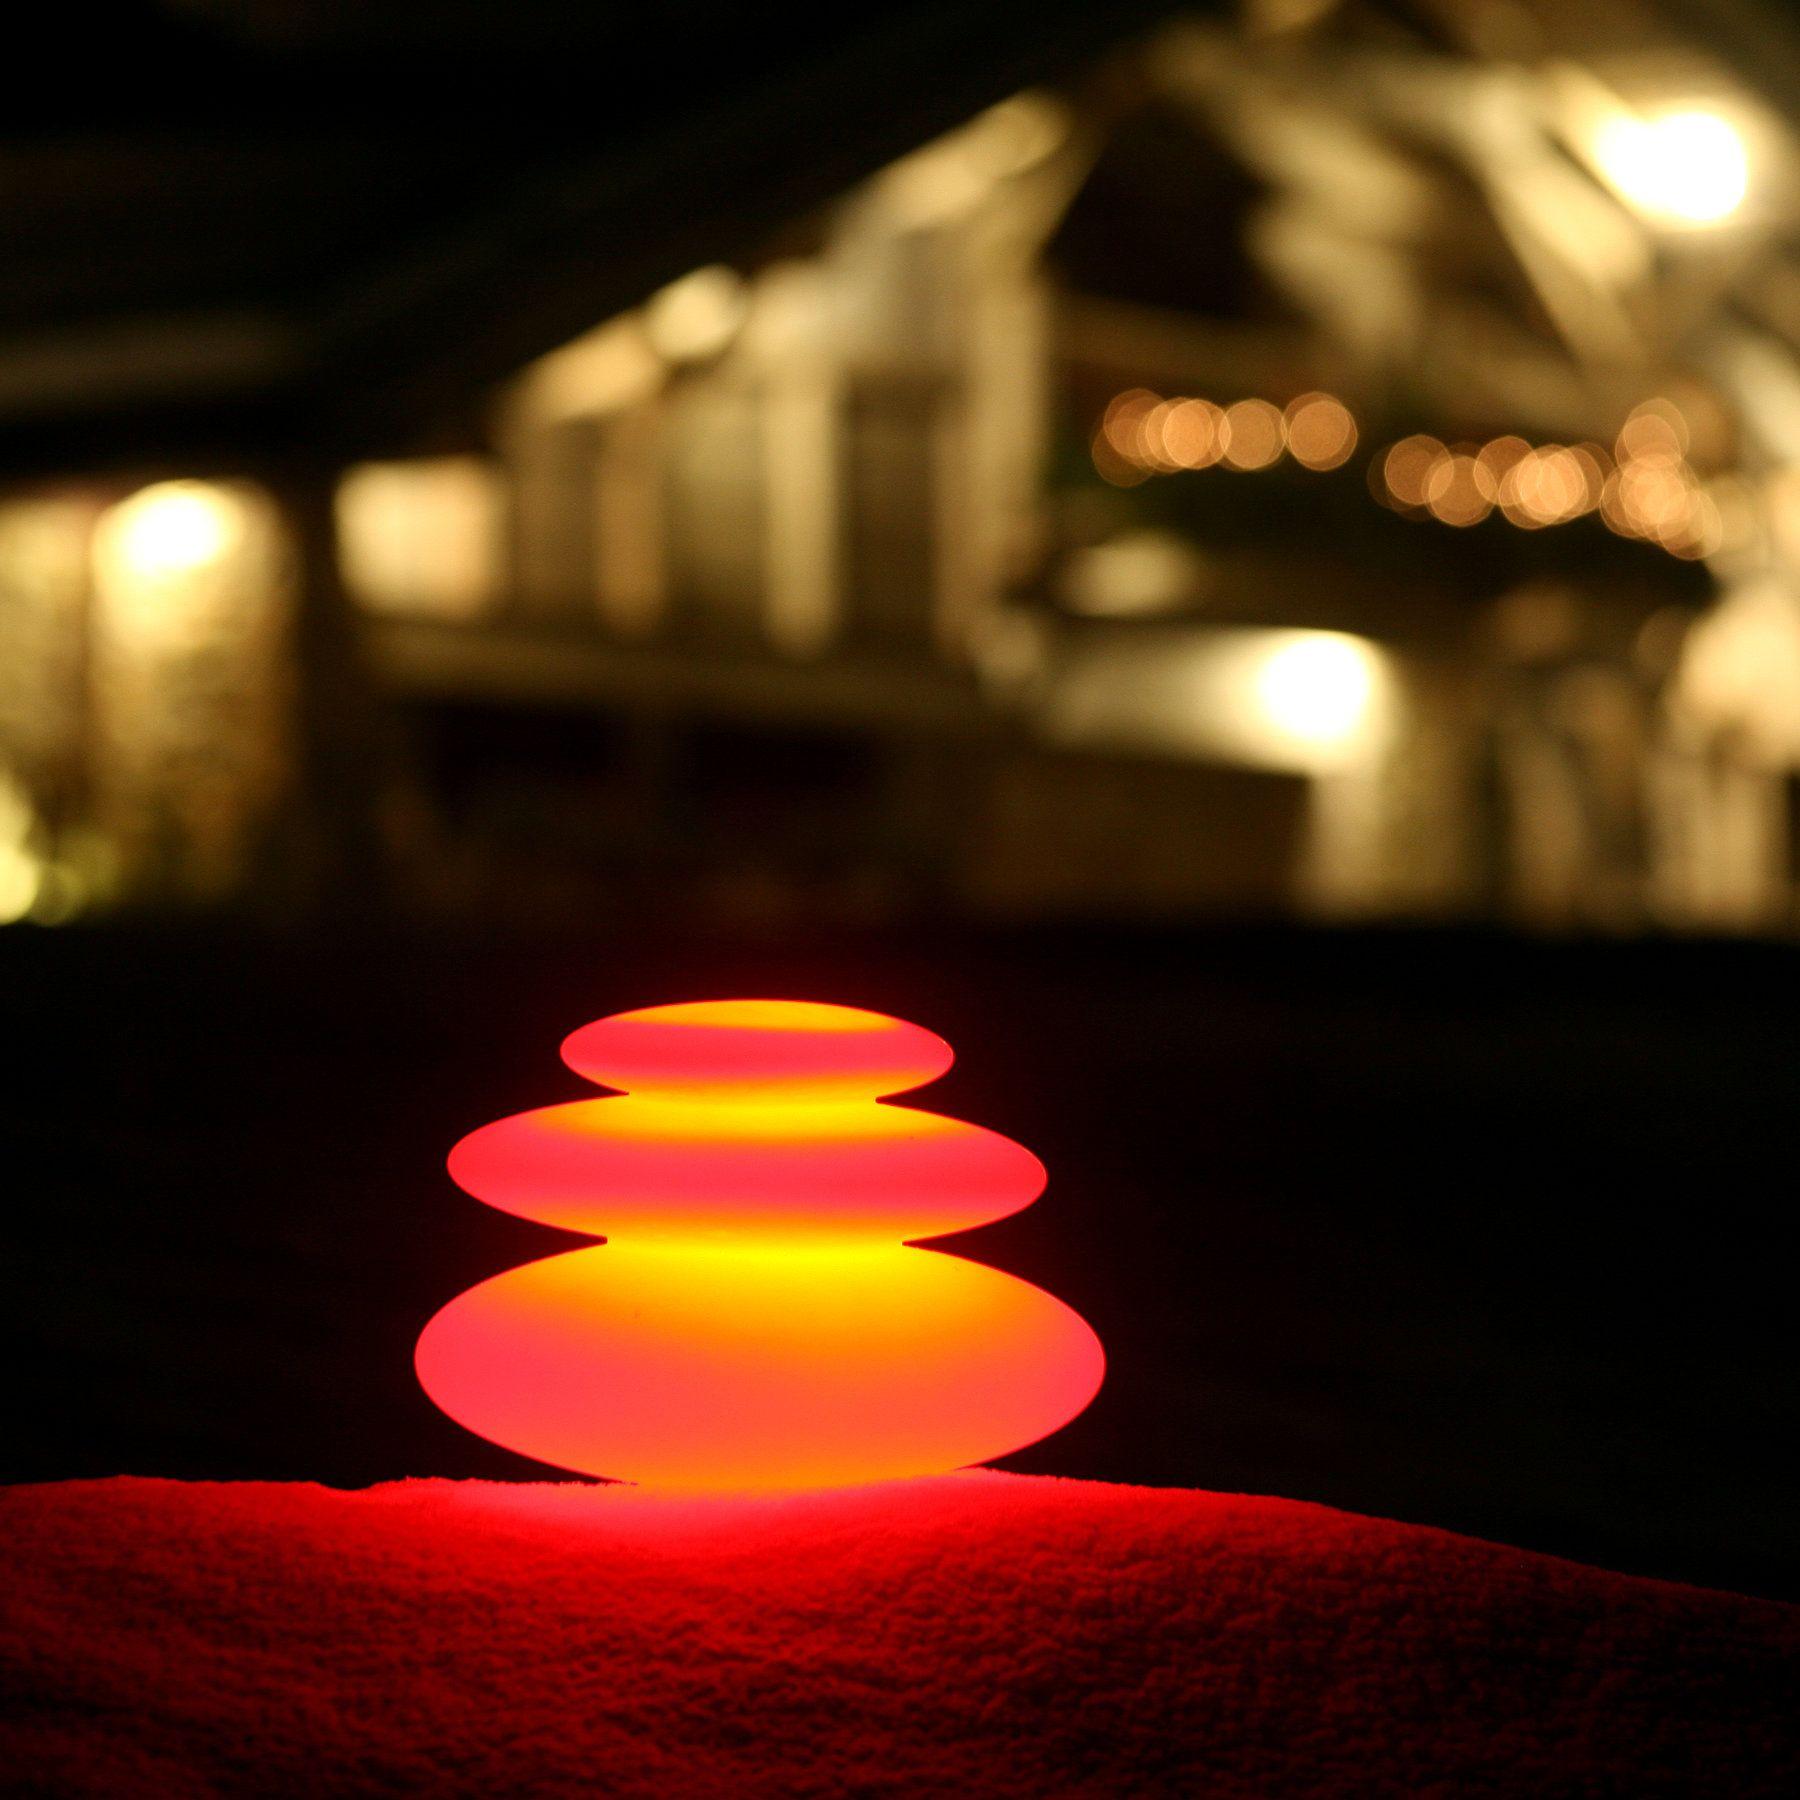 22-Light Poolside and Floating Light